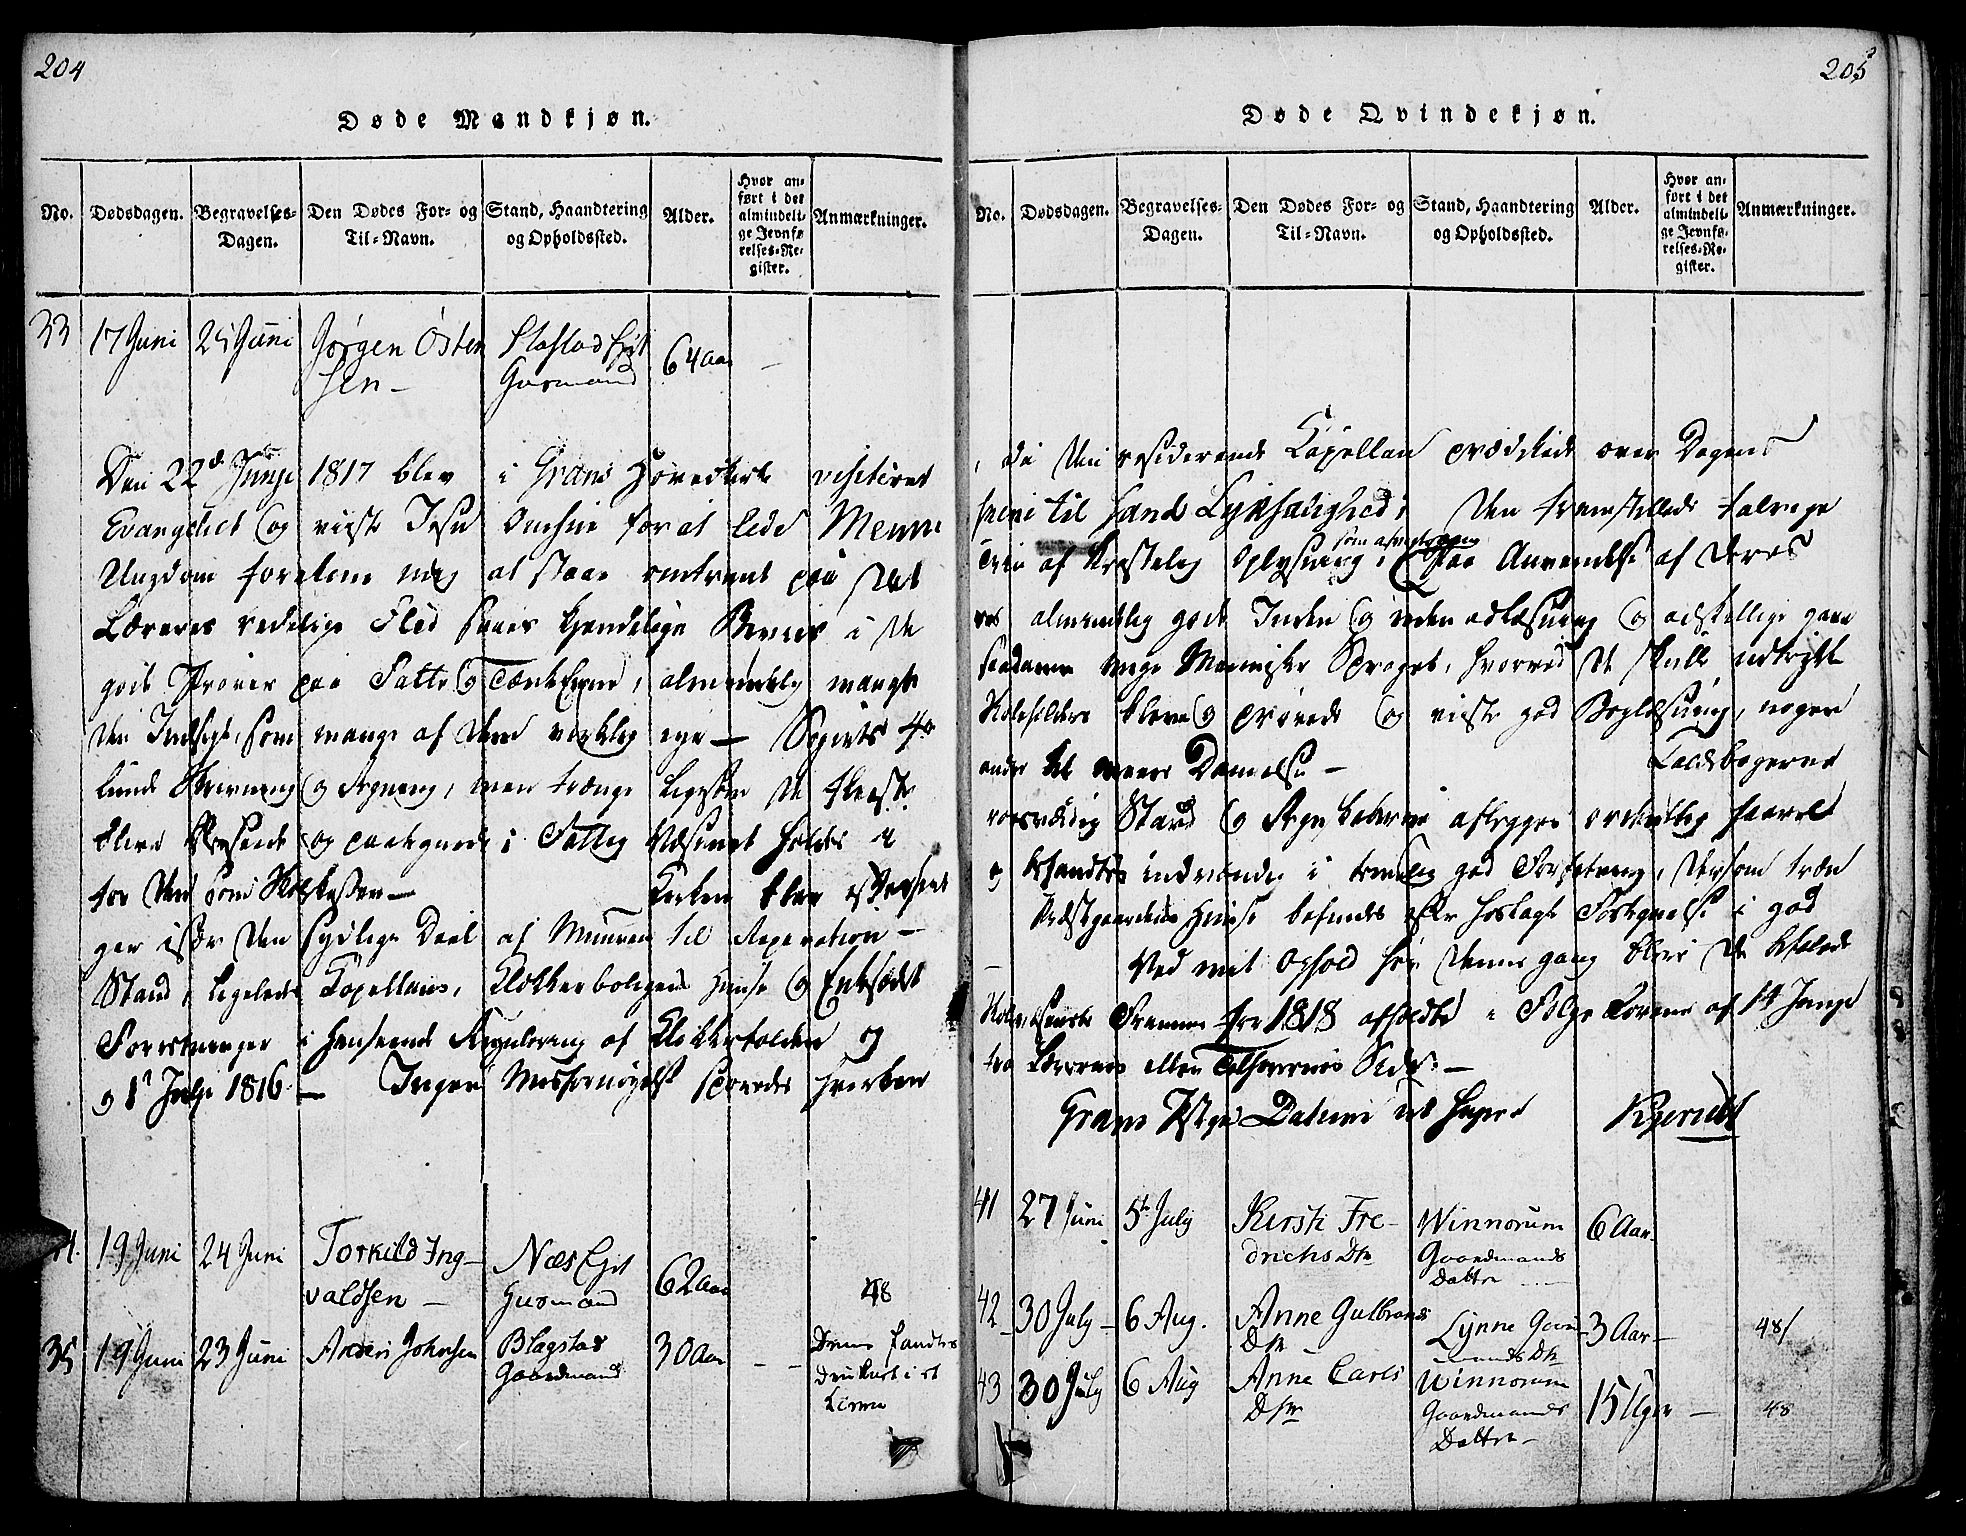 SAH, Gran prestekontor, Ministerialbok nr. 9, 1815-1824, s. 204-205